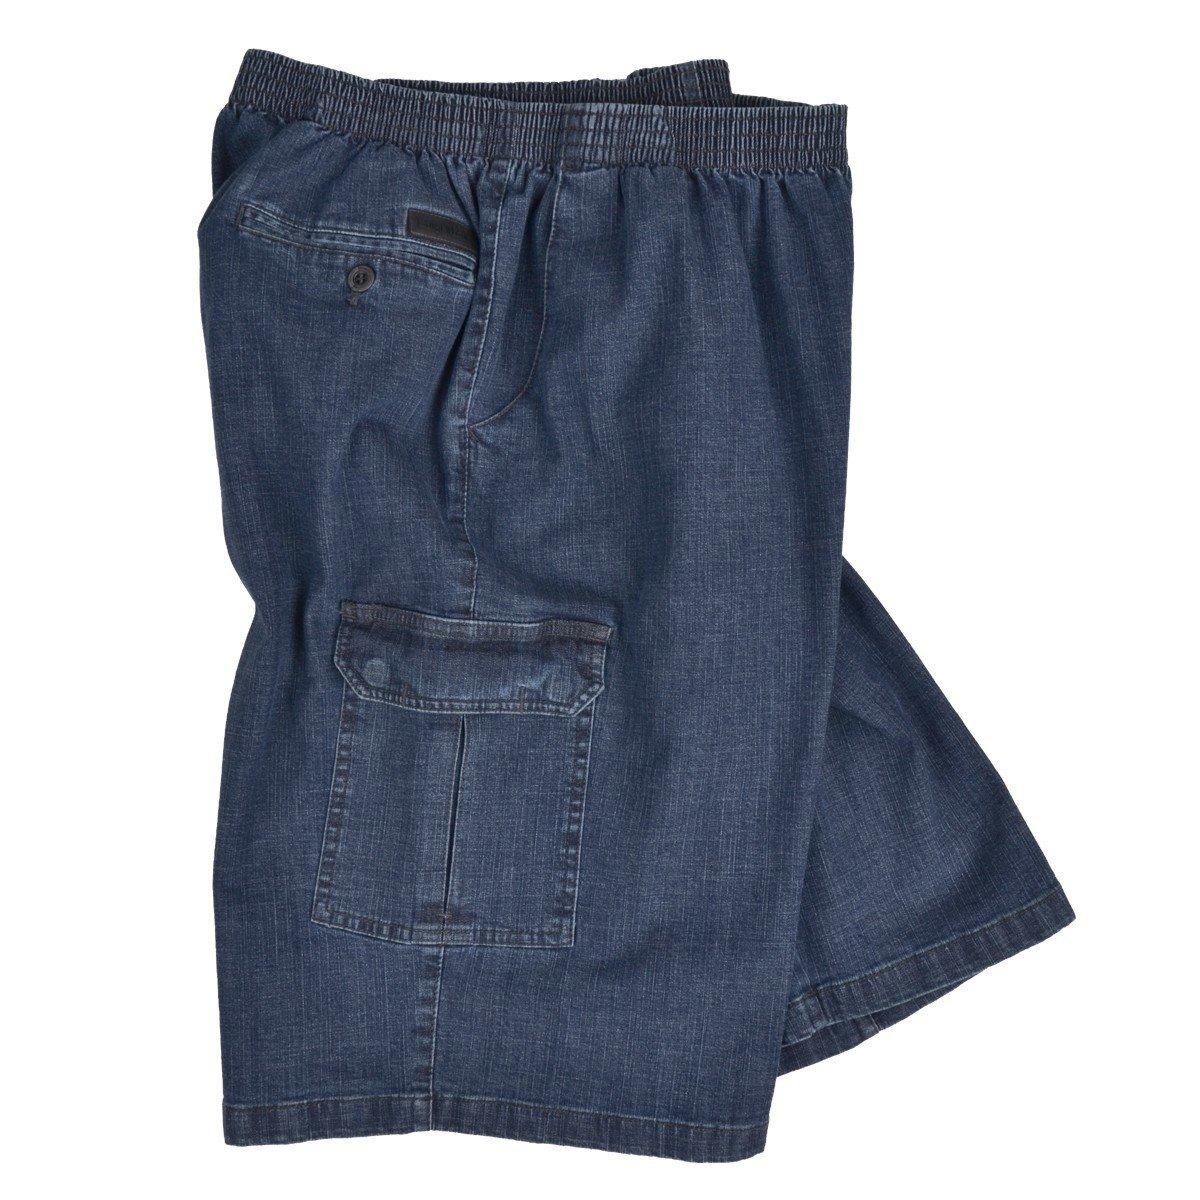 Luigi Morini Jeans Bermuda Gummibund Schlupfhose blau /Übergr/ö/ße